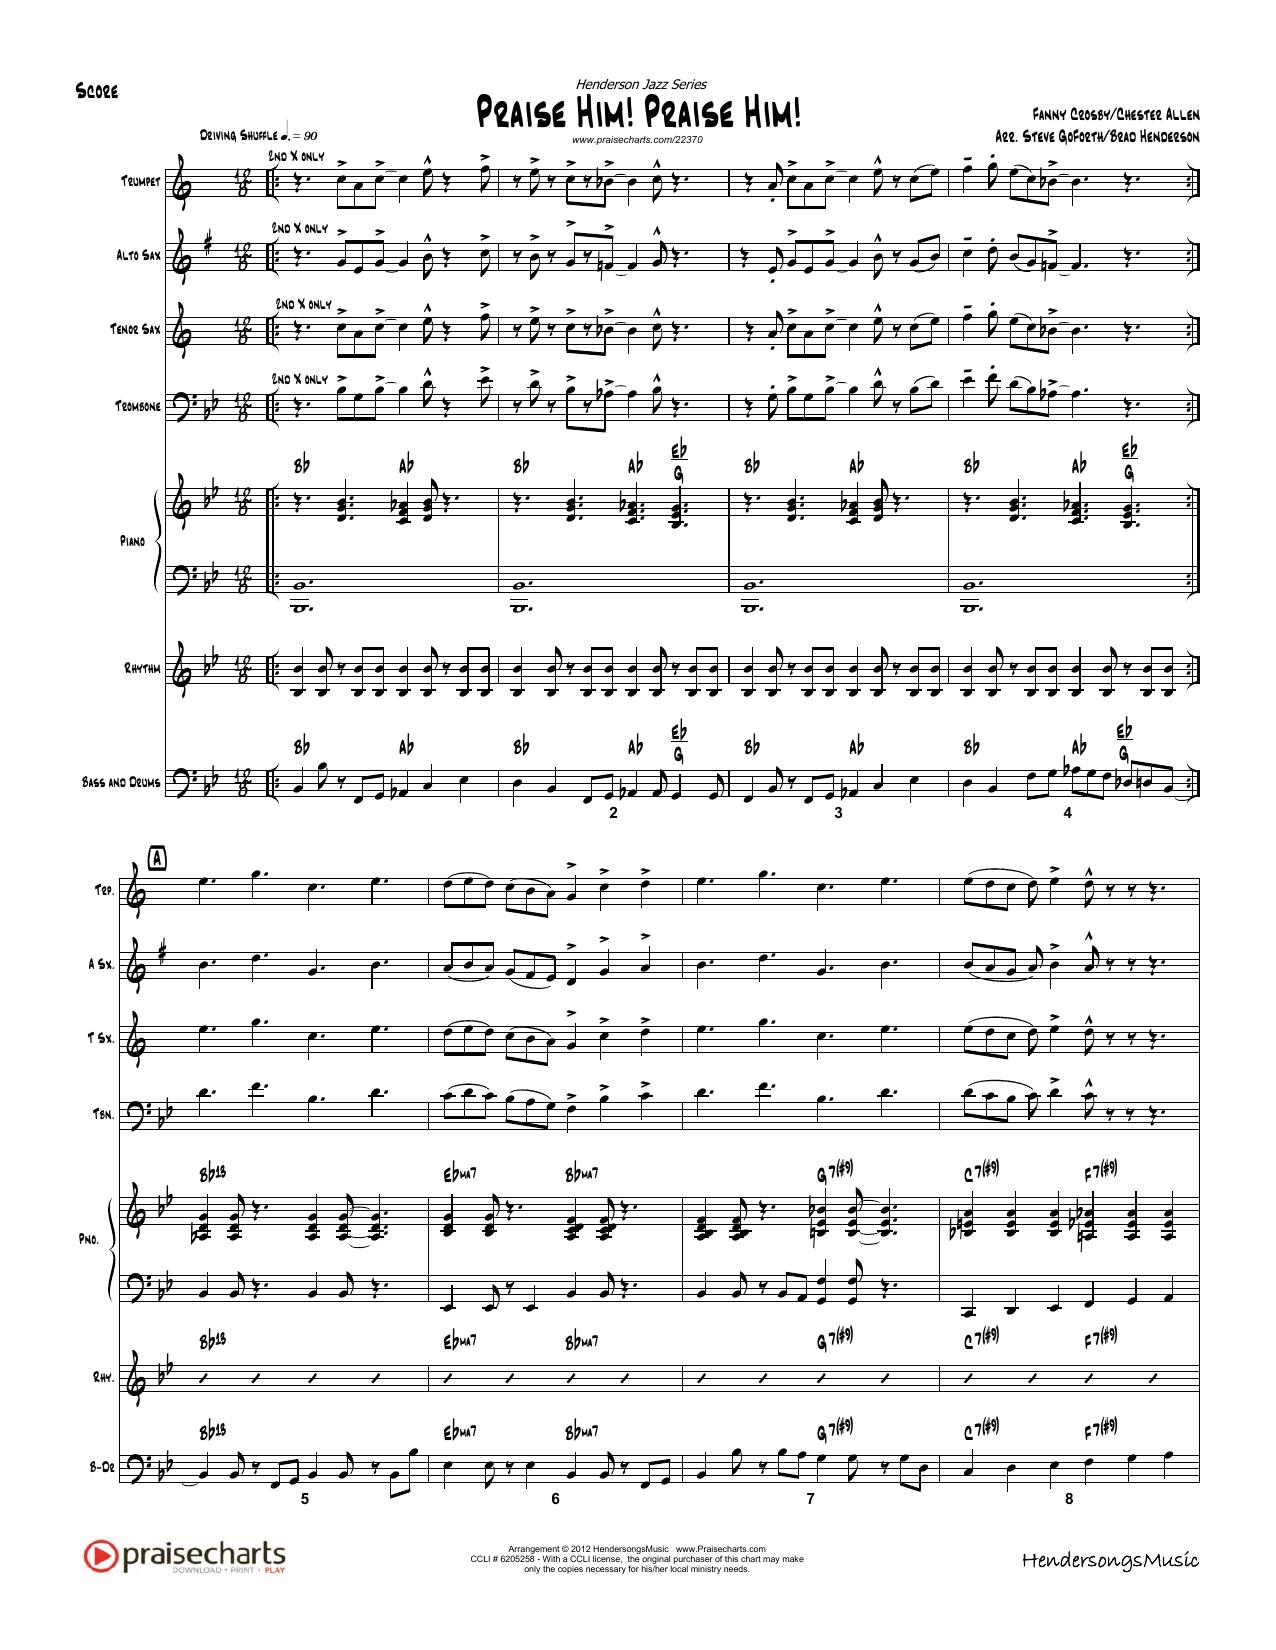 Fanny Crosby - Praise Him Praise Him - Orchestration